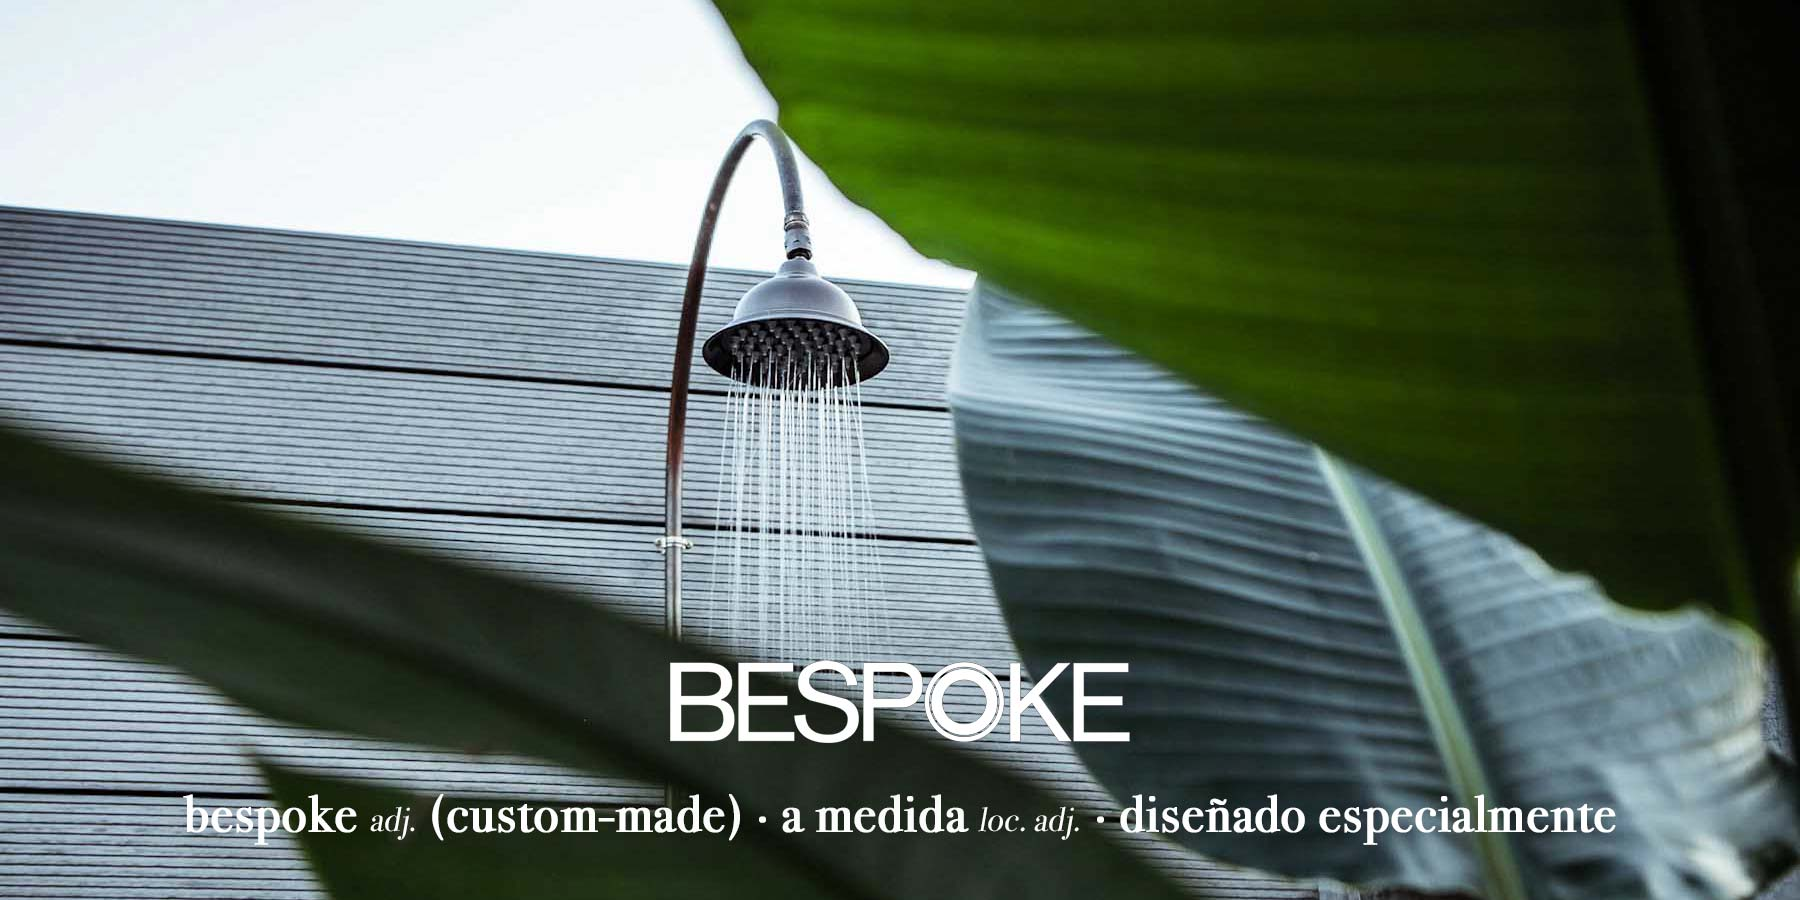 HOME_BESPOKE_BAJO EL AGUA_01